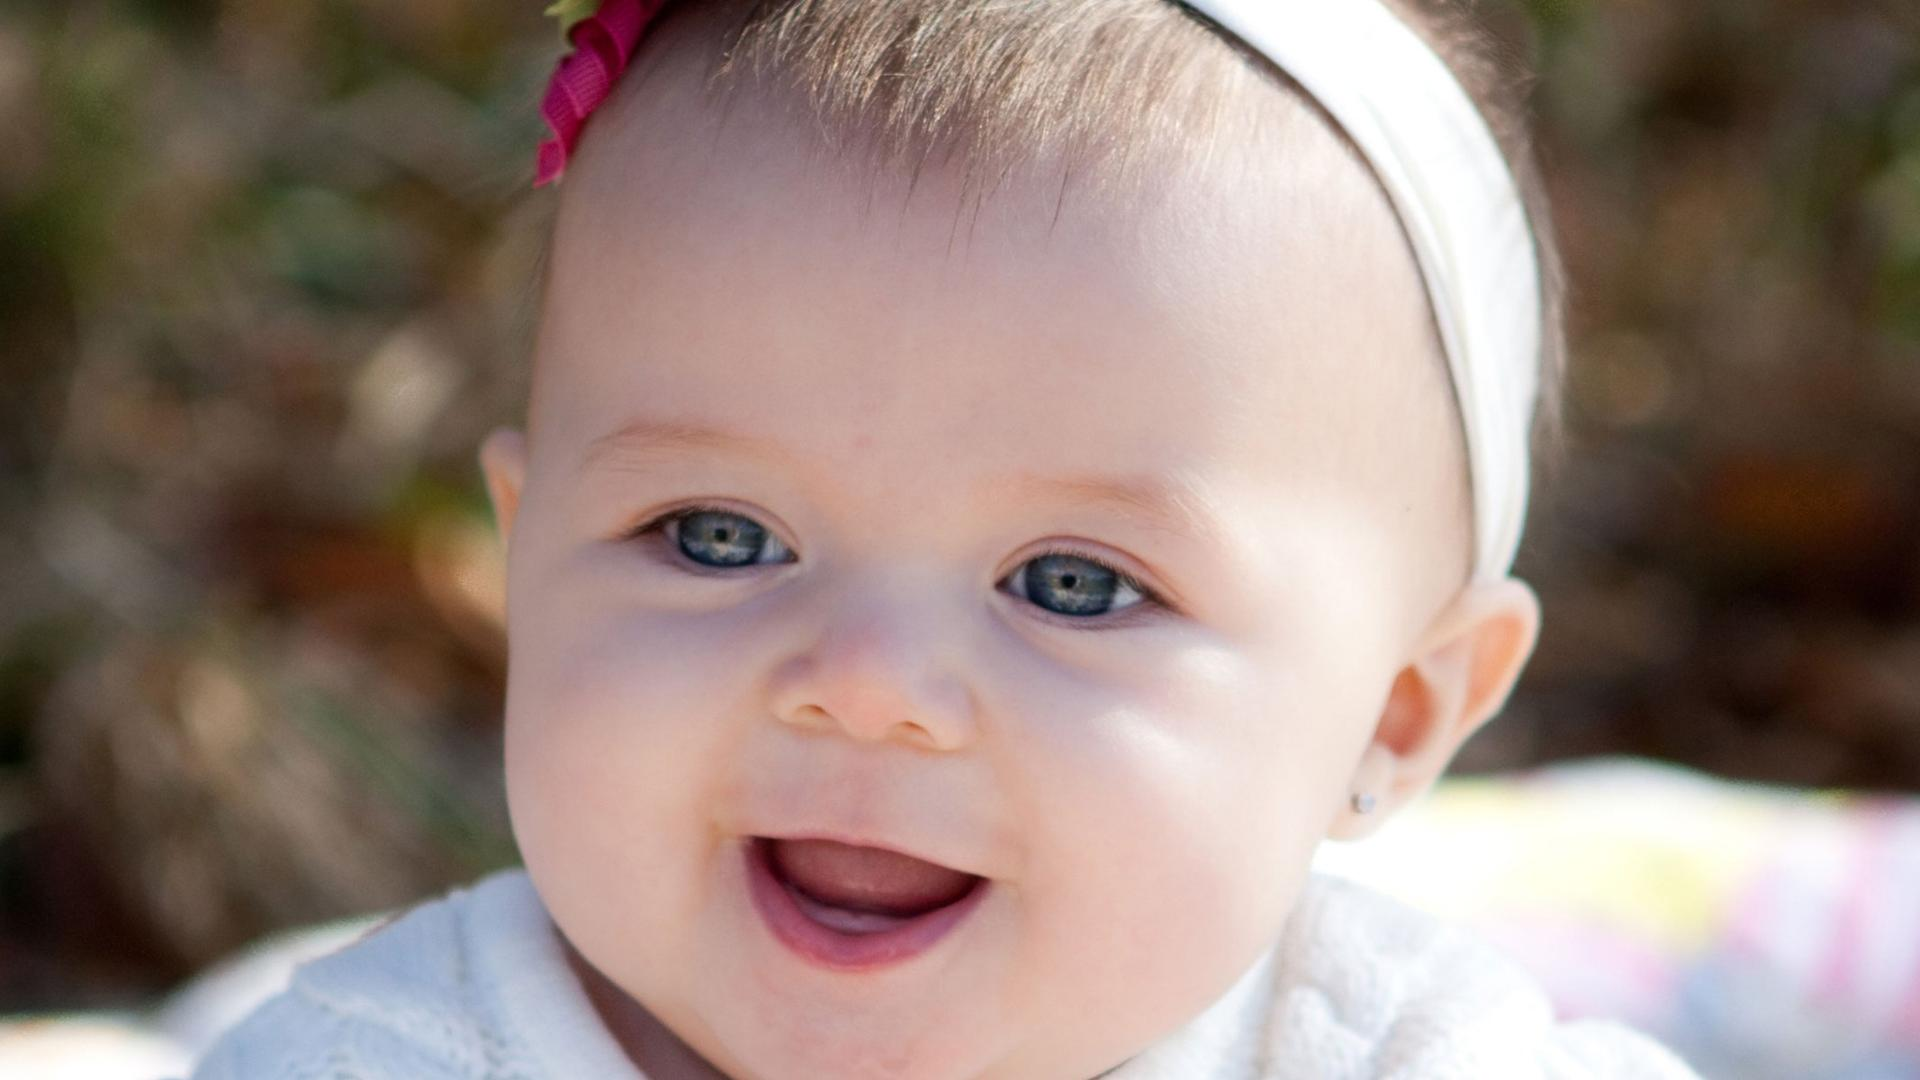 Free Download Cute Baby Girl Hd Wallpaper 1457 Baby Bwallescom